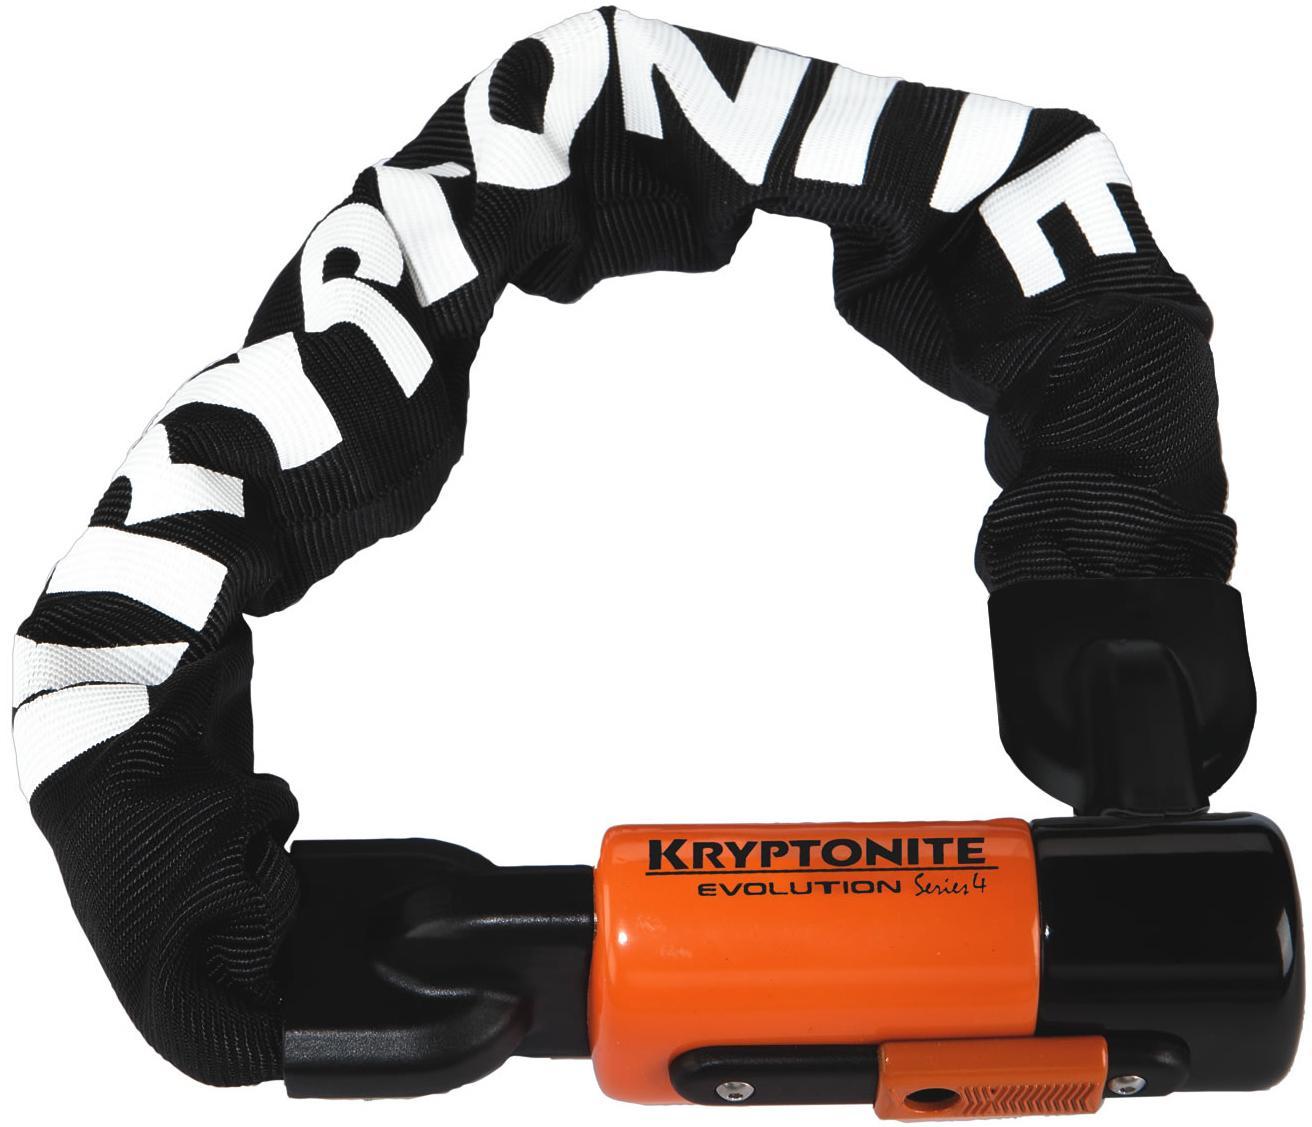 Kryptonite Evo Series 4 1055